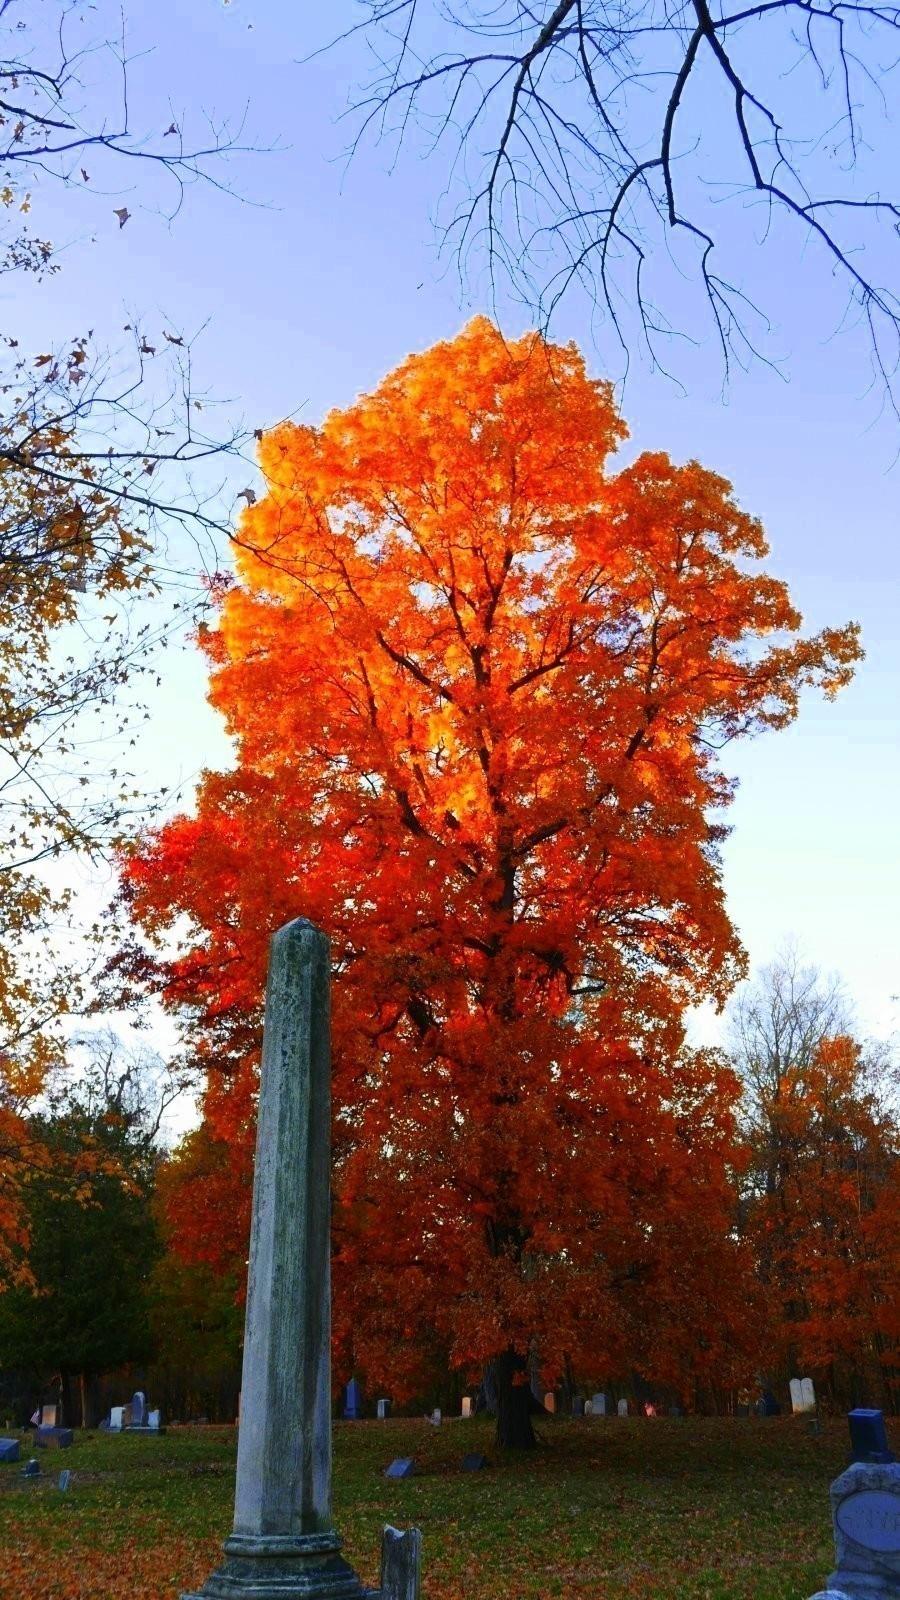 LX100 Oakwood luminous leaves sunset 012-002.JPG